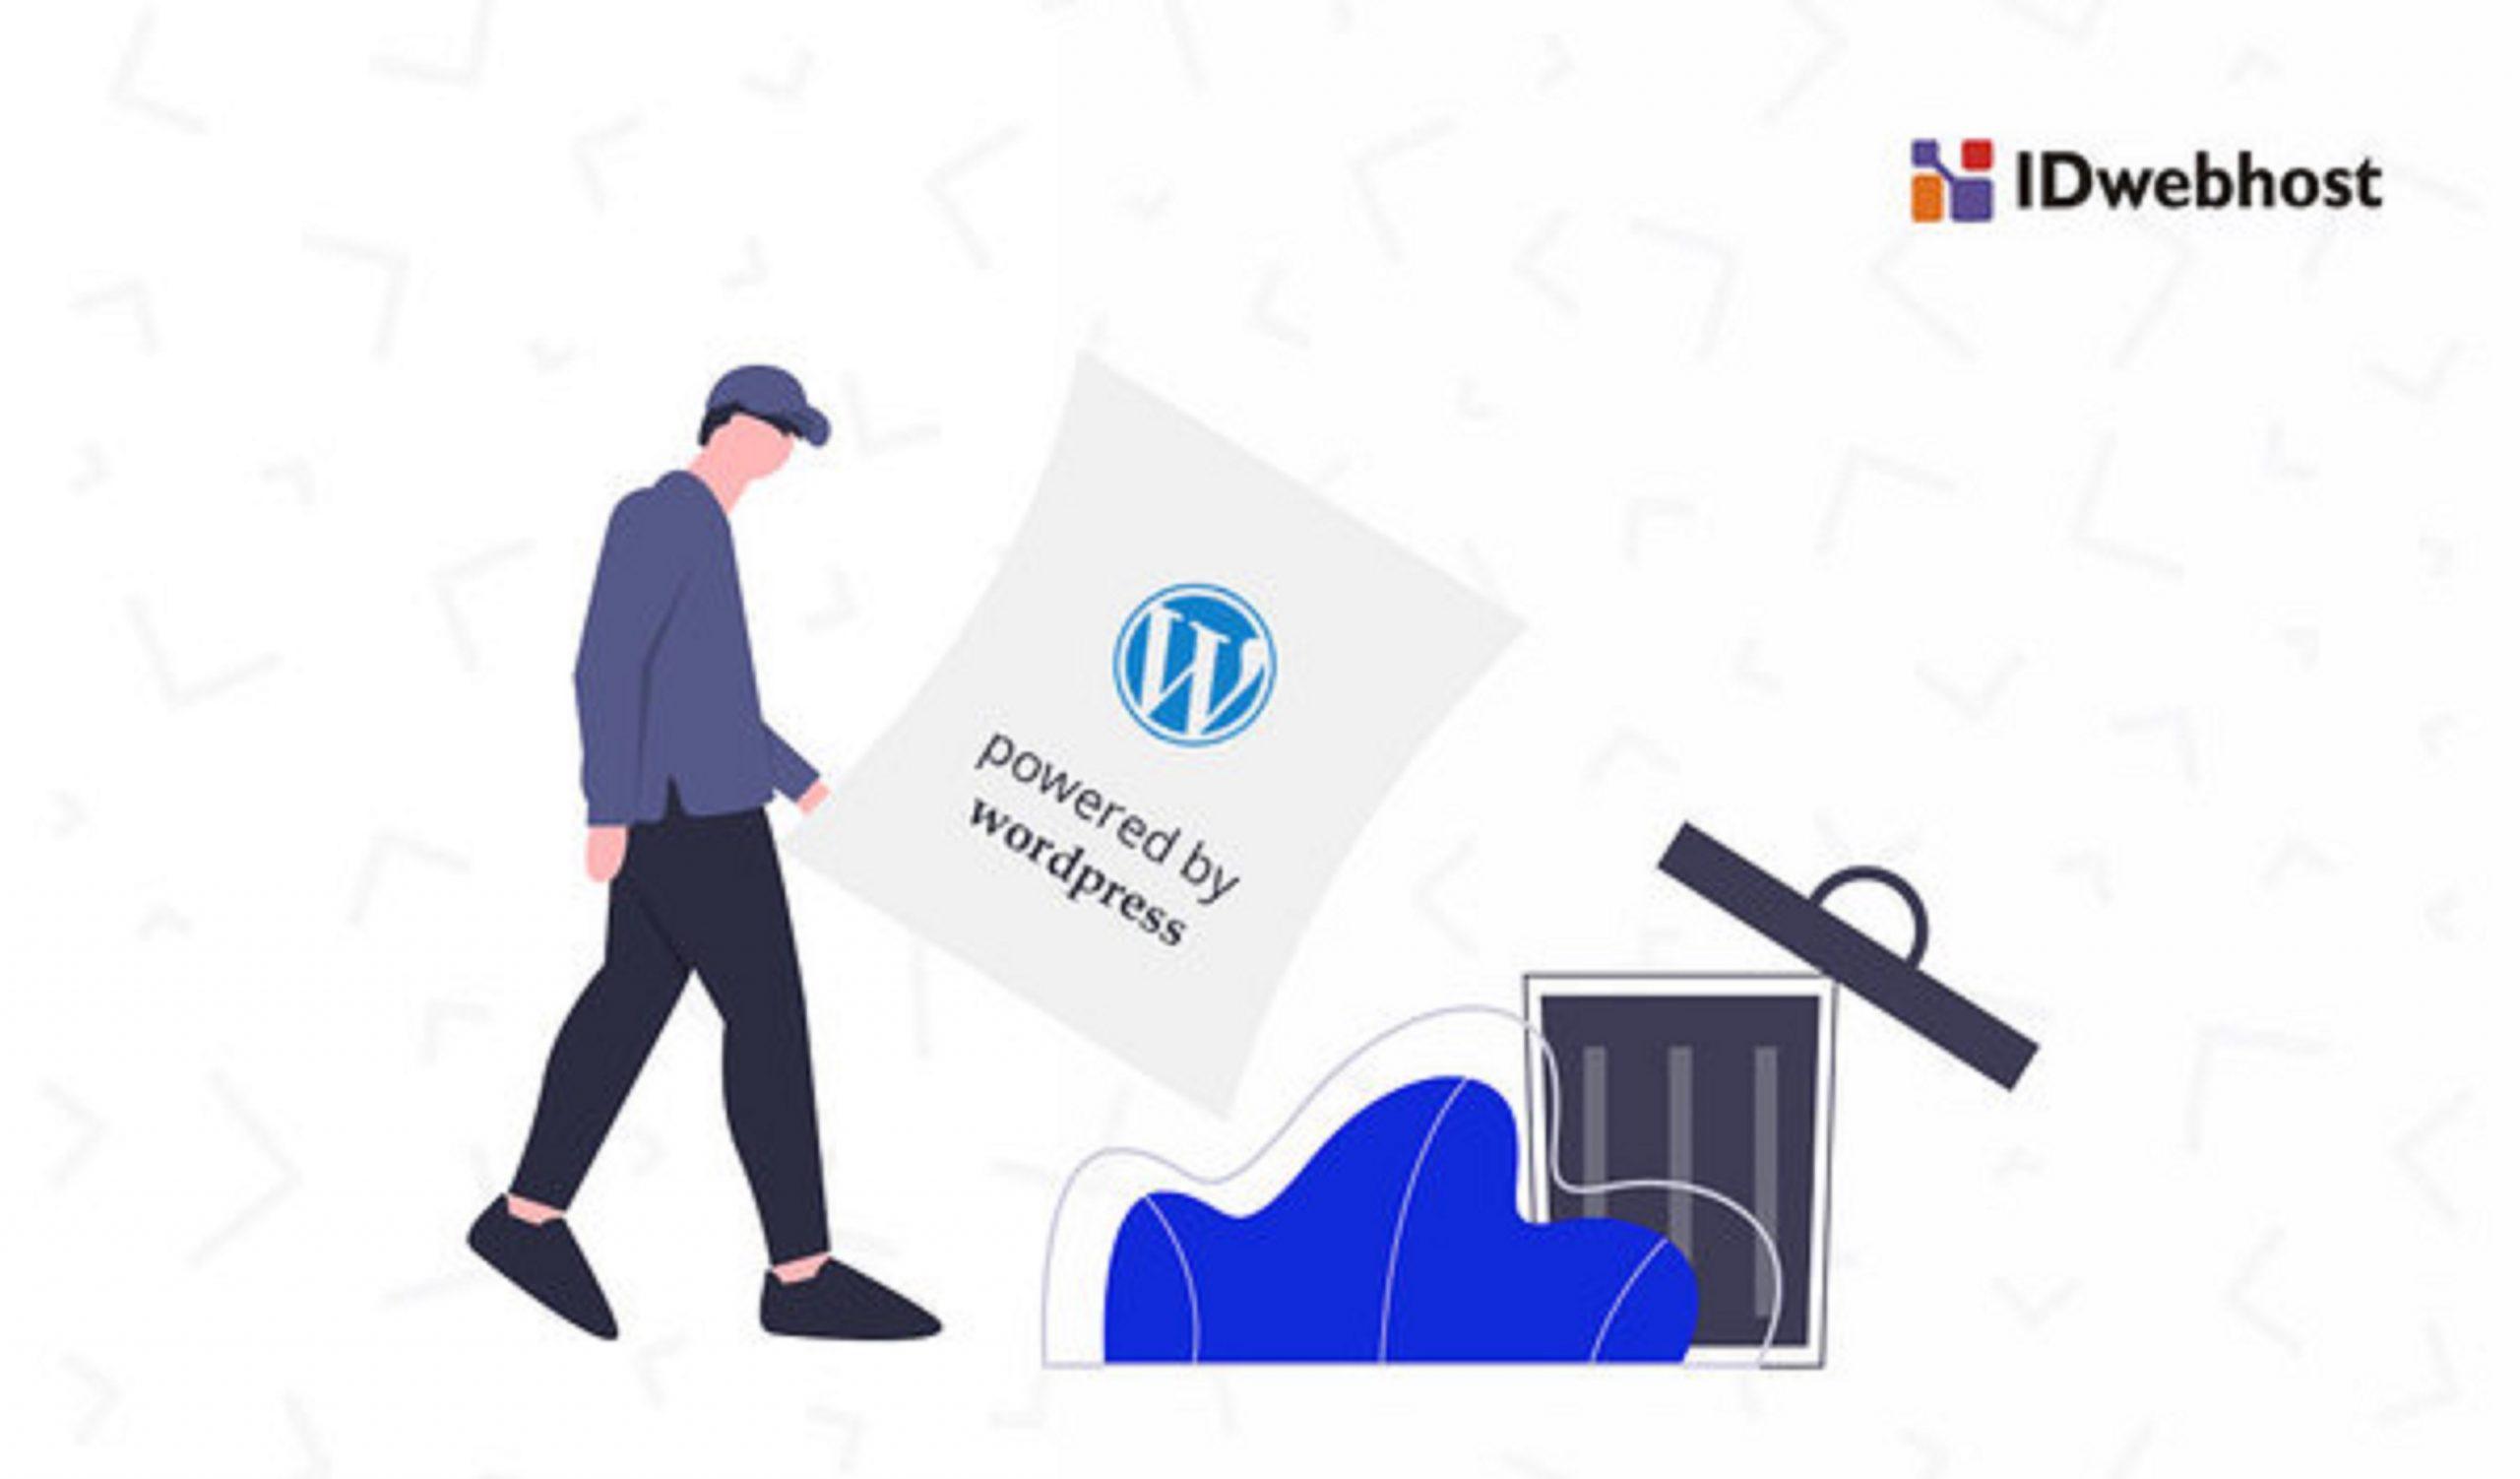 Cara hilangkan tulisan Powered by WordPress